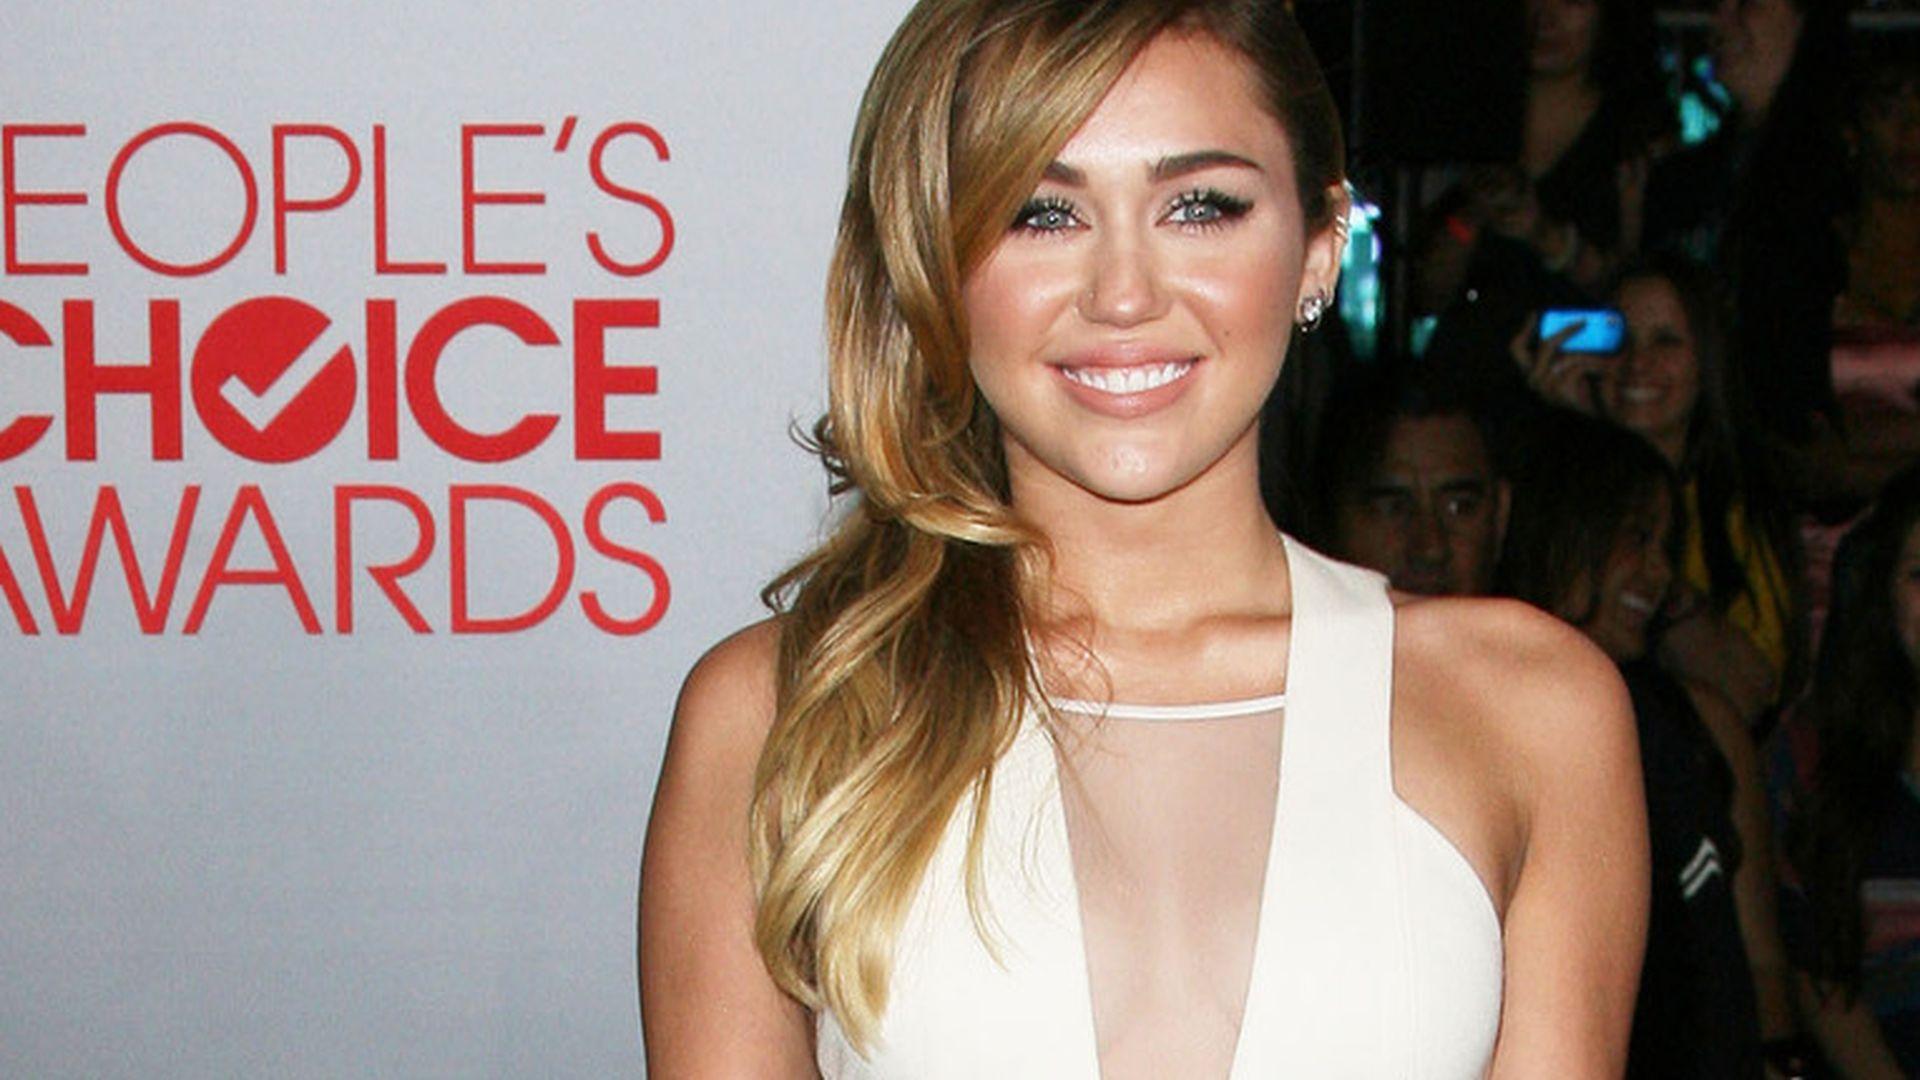 Miley Cyrus: Brust-OP? Nein! - tomhengstde